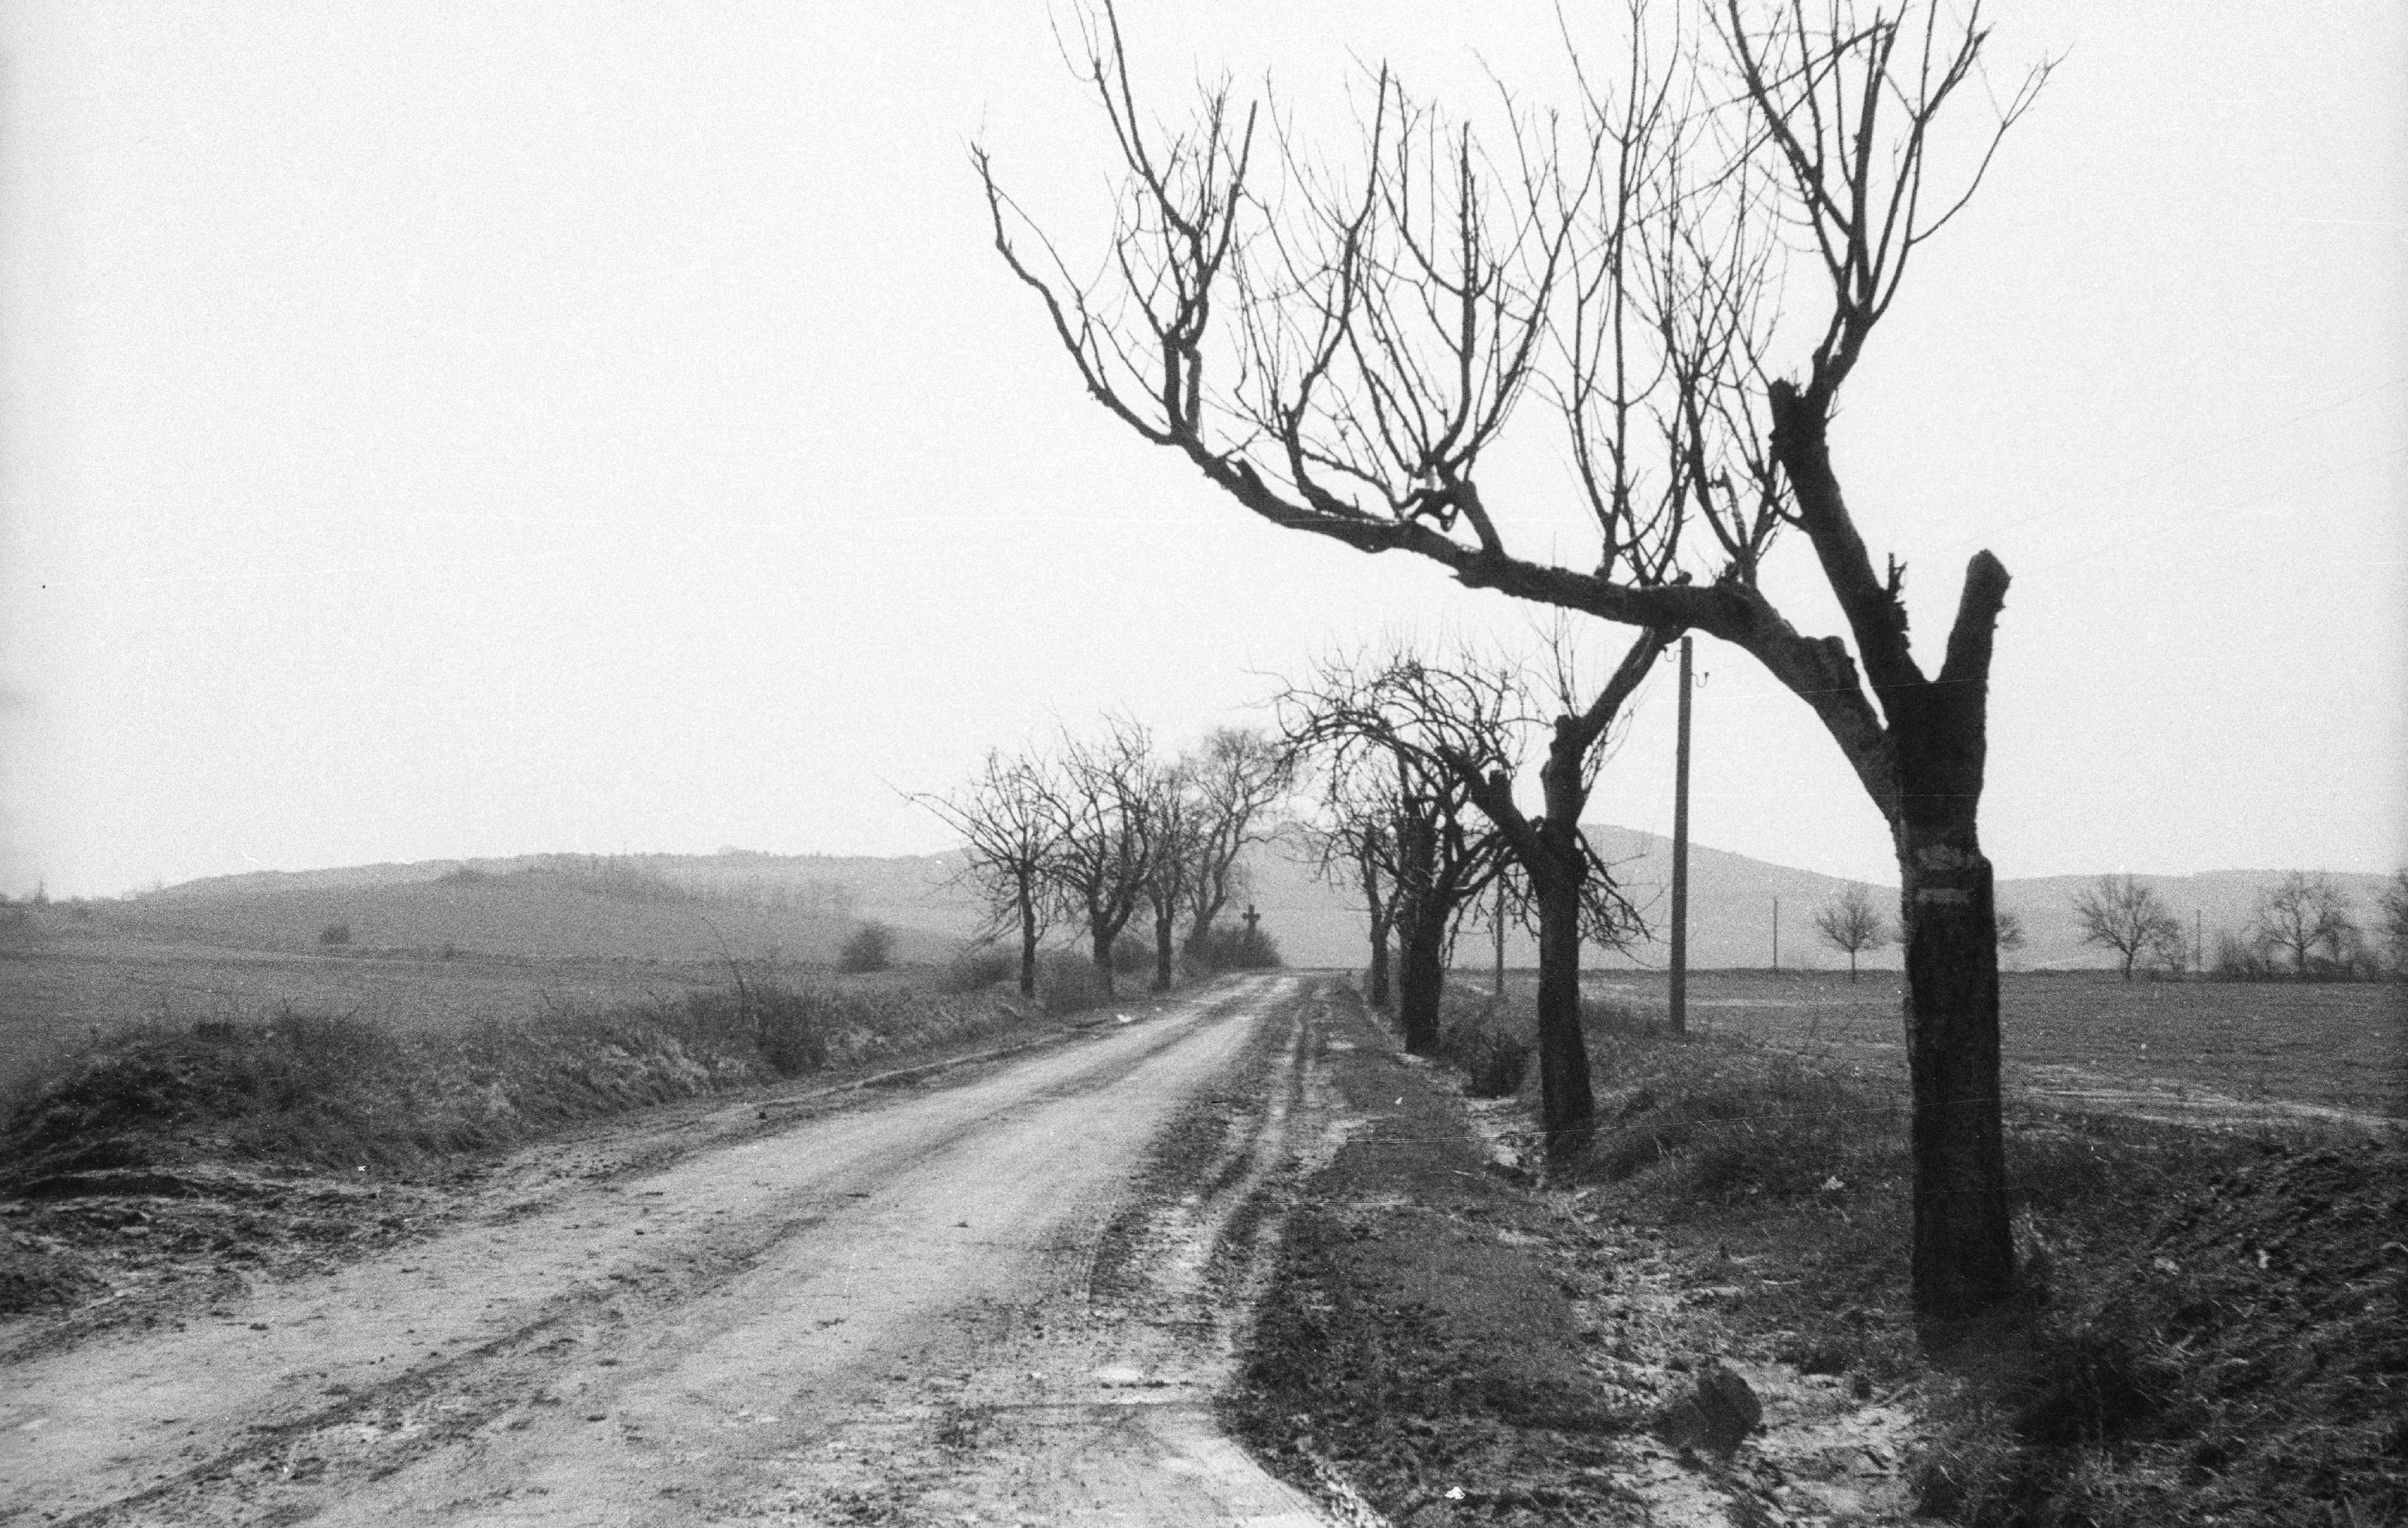 budakalaszi_ut_1965_orig_meszaros_zoltan_1.jpg